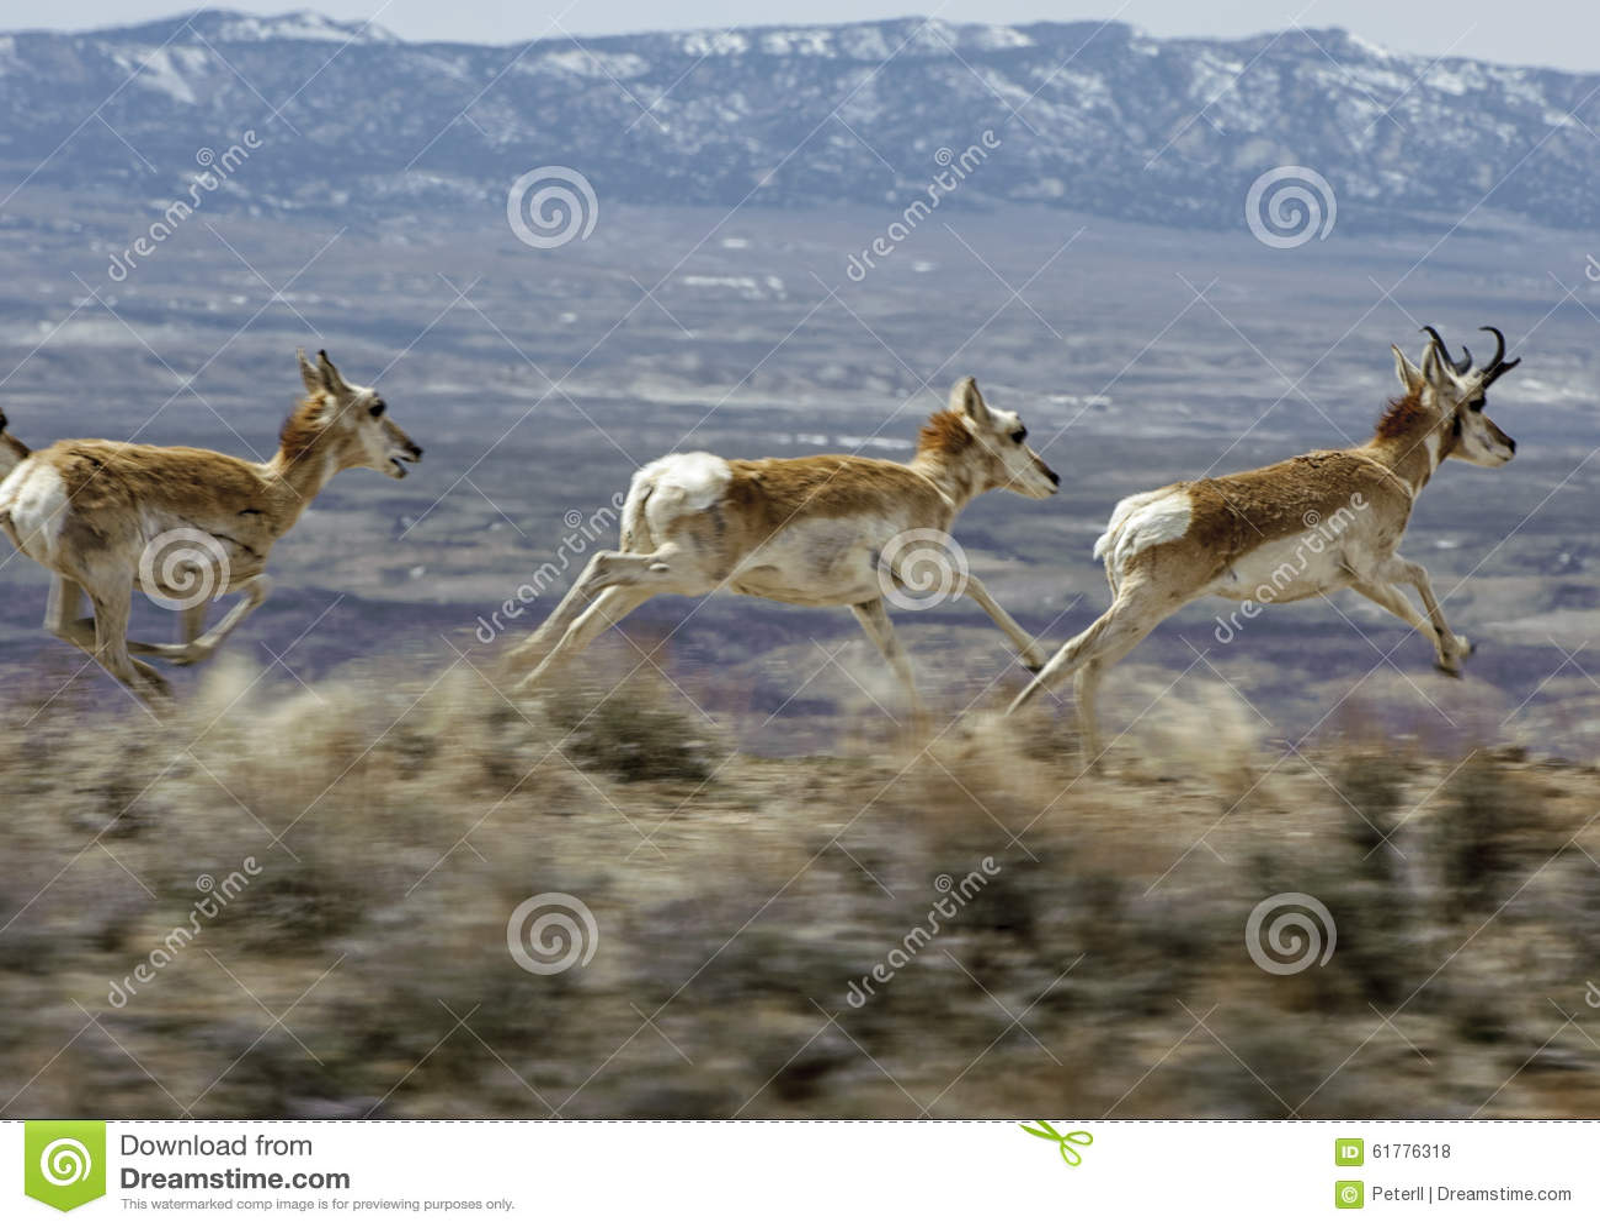 PPronghorn Antelope (Antilocapra americana)